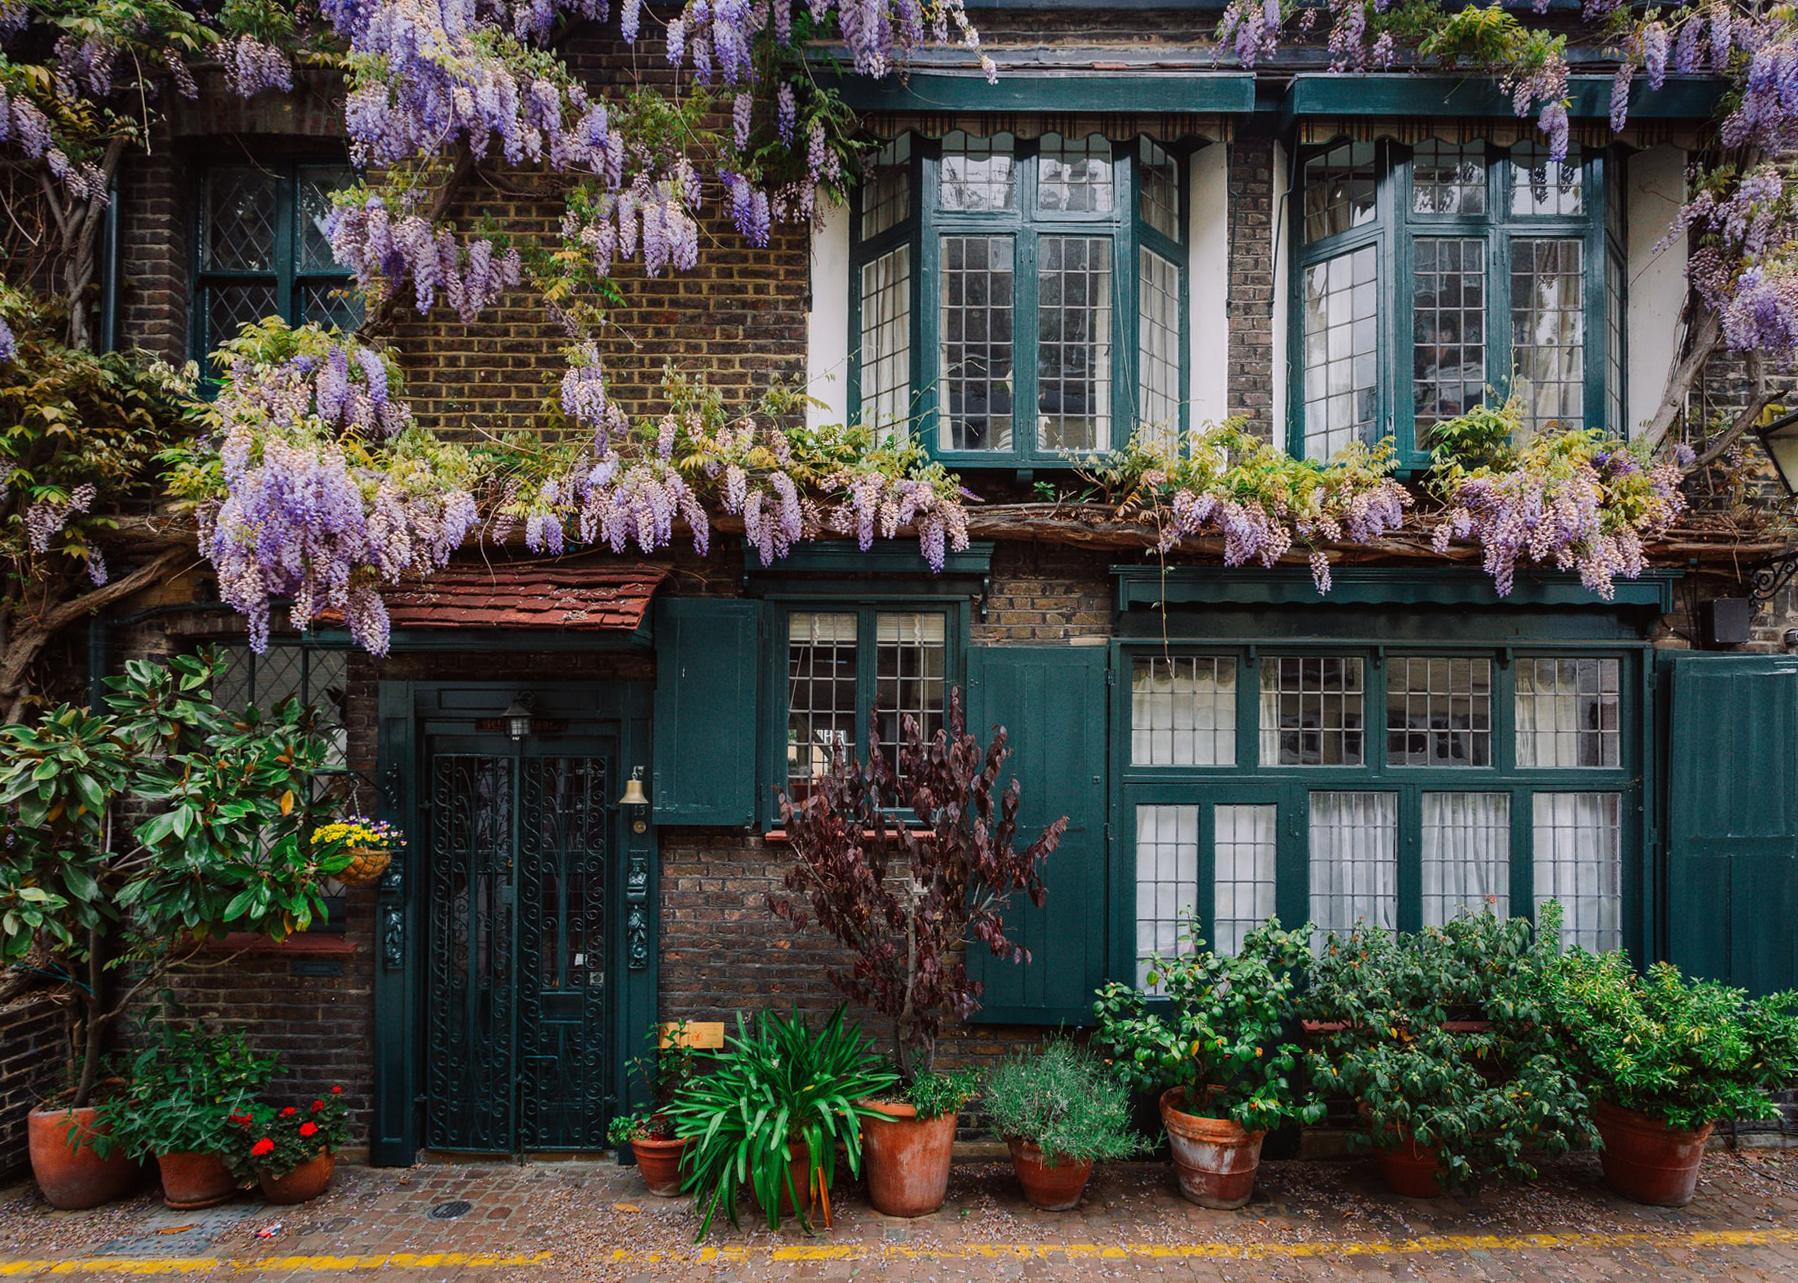 Tips For Stunning Garden Photography